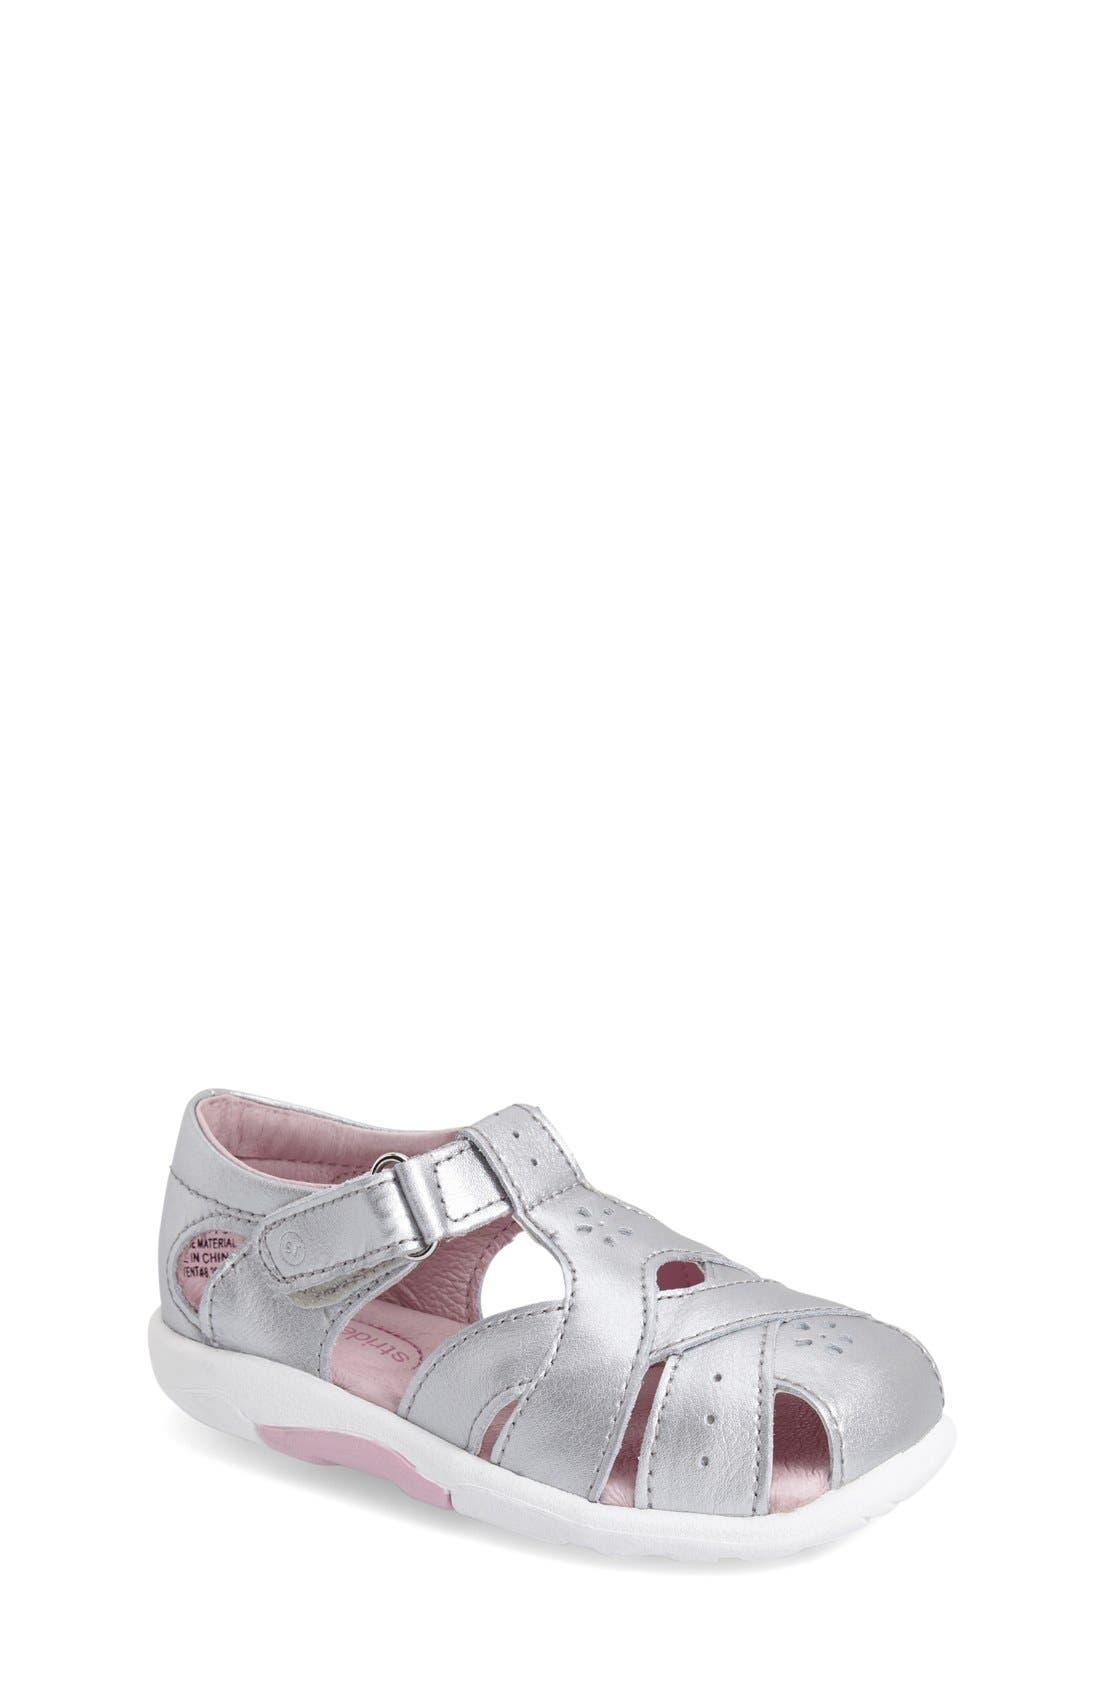 Main Image - Stride Rite 'Tulip' Sandal (Baby, Walker & Toddler)